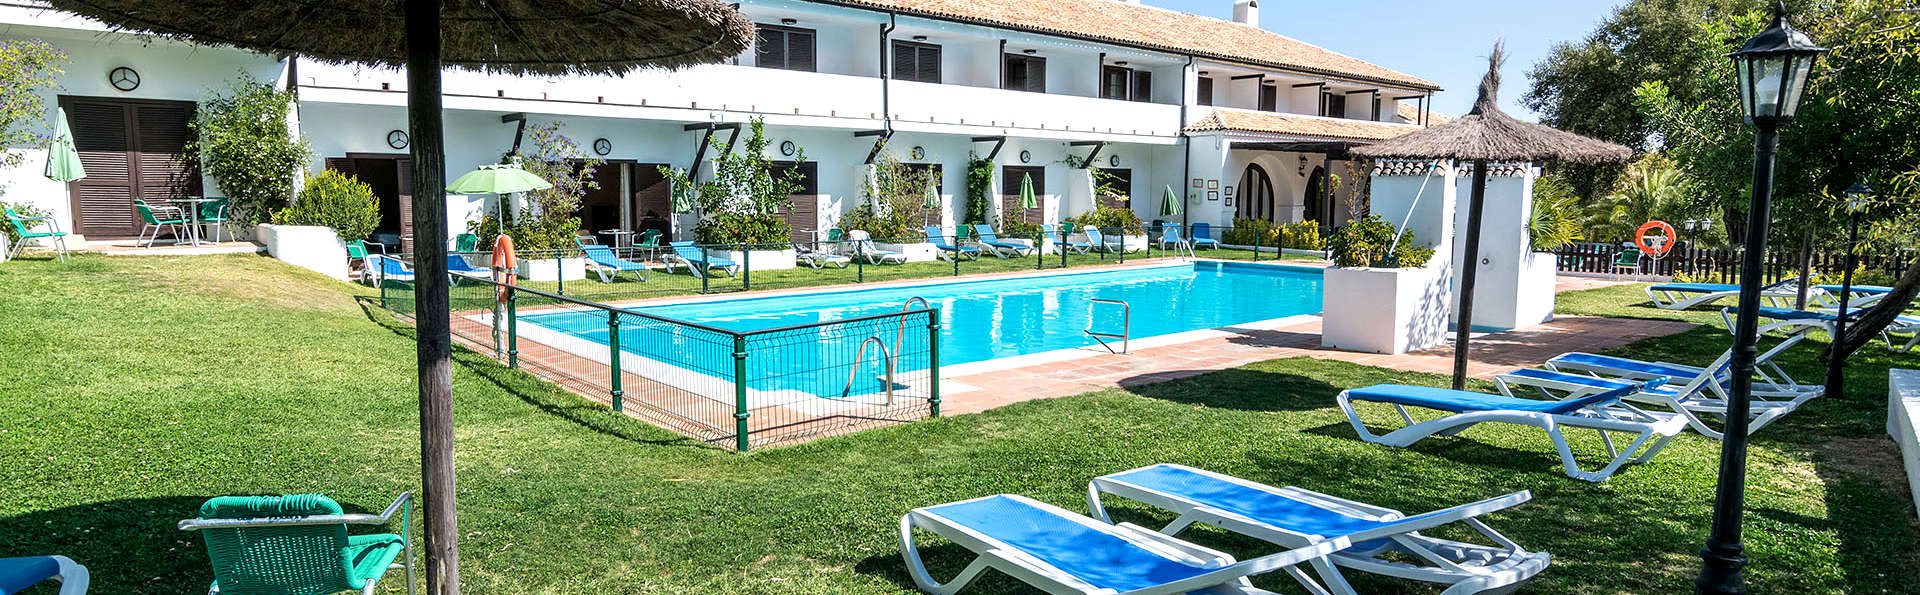 Hotel Villa de Grazalema - EDIT_NEW_POOL.jpg